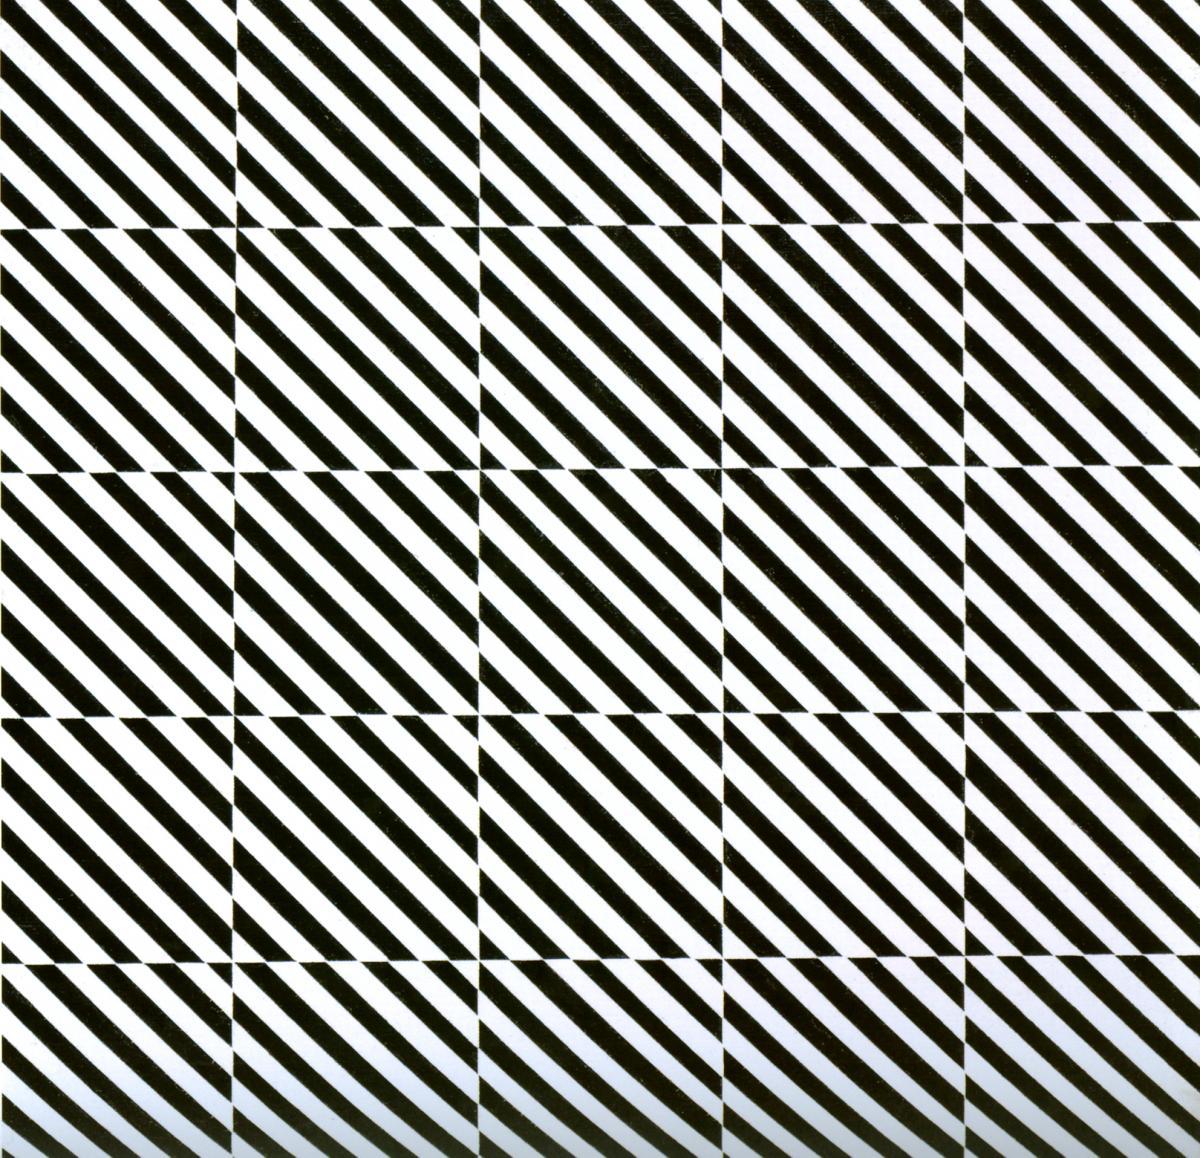 Célèbre Phénoménologie de la perception | RMN - Grand Palais GM45